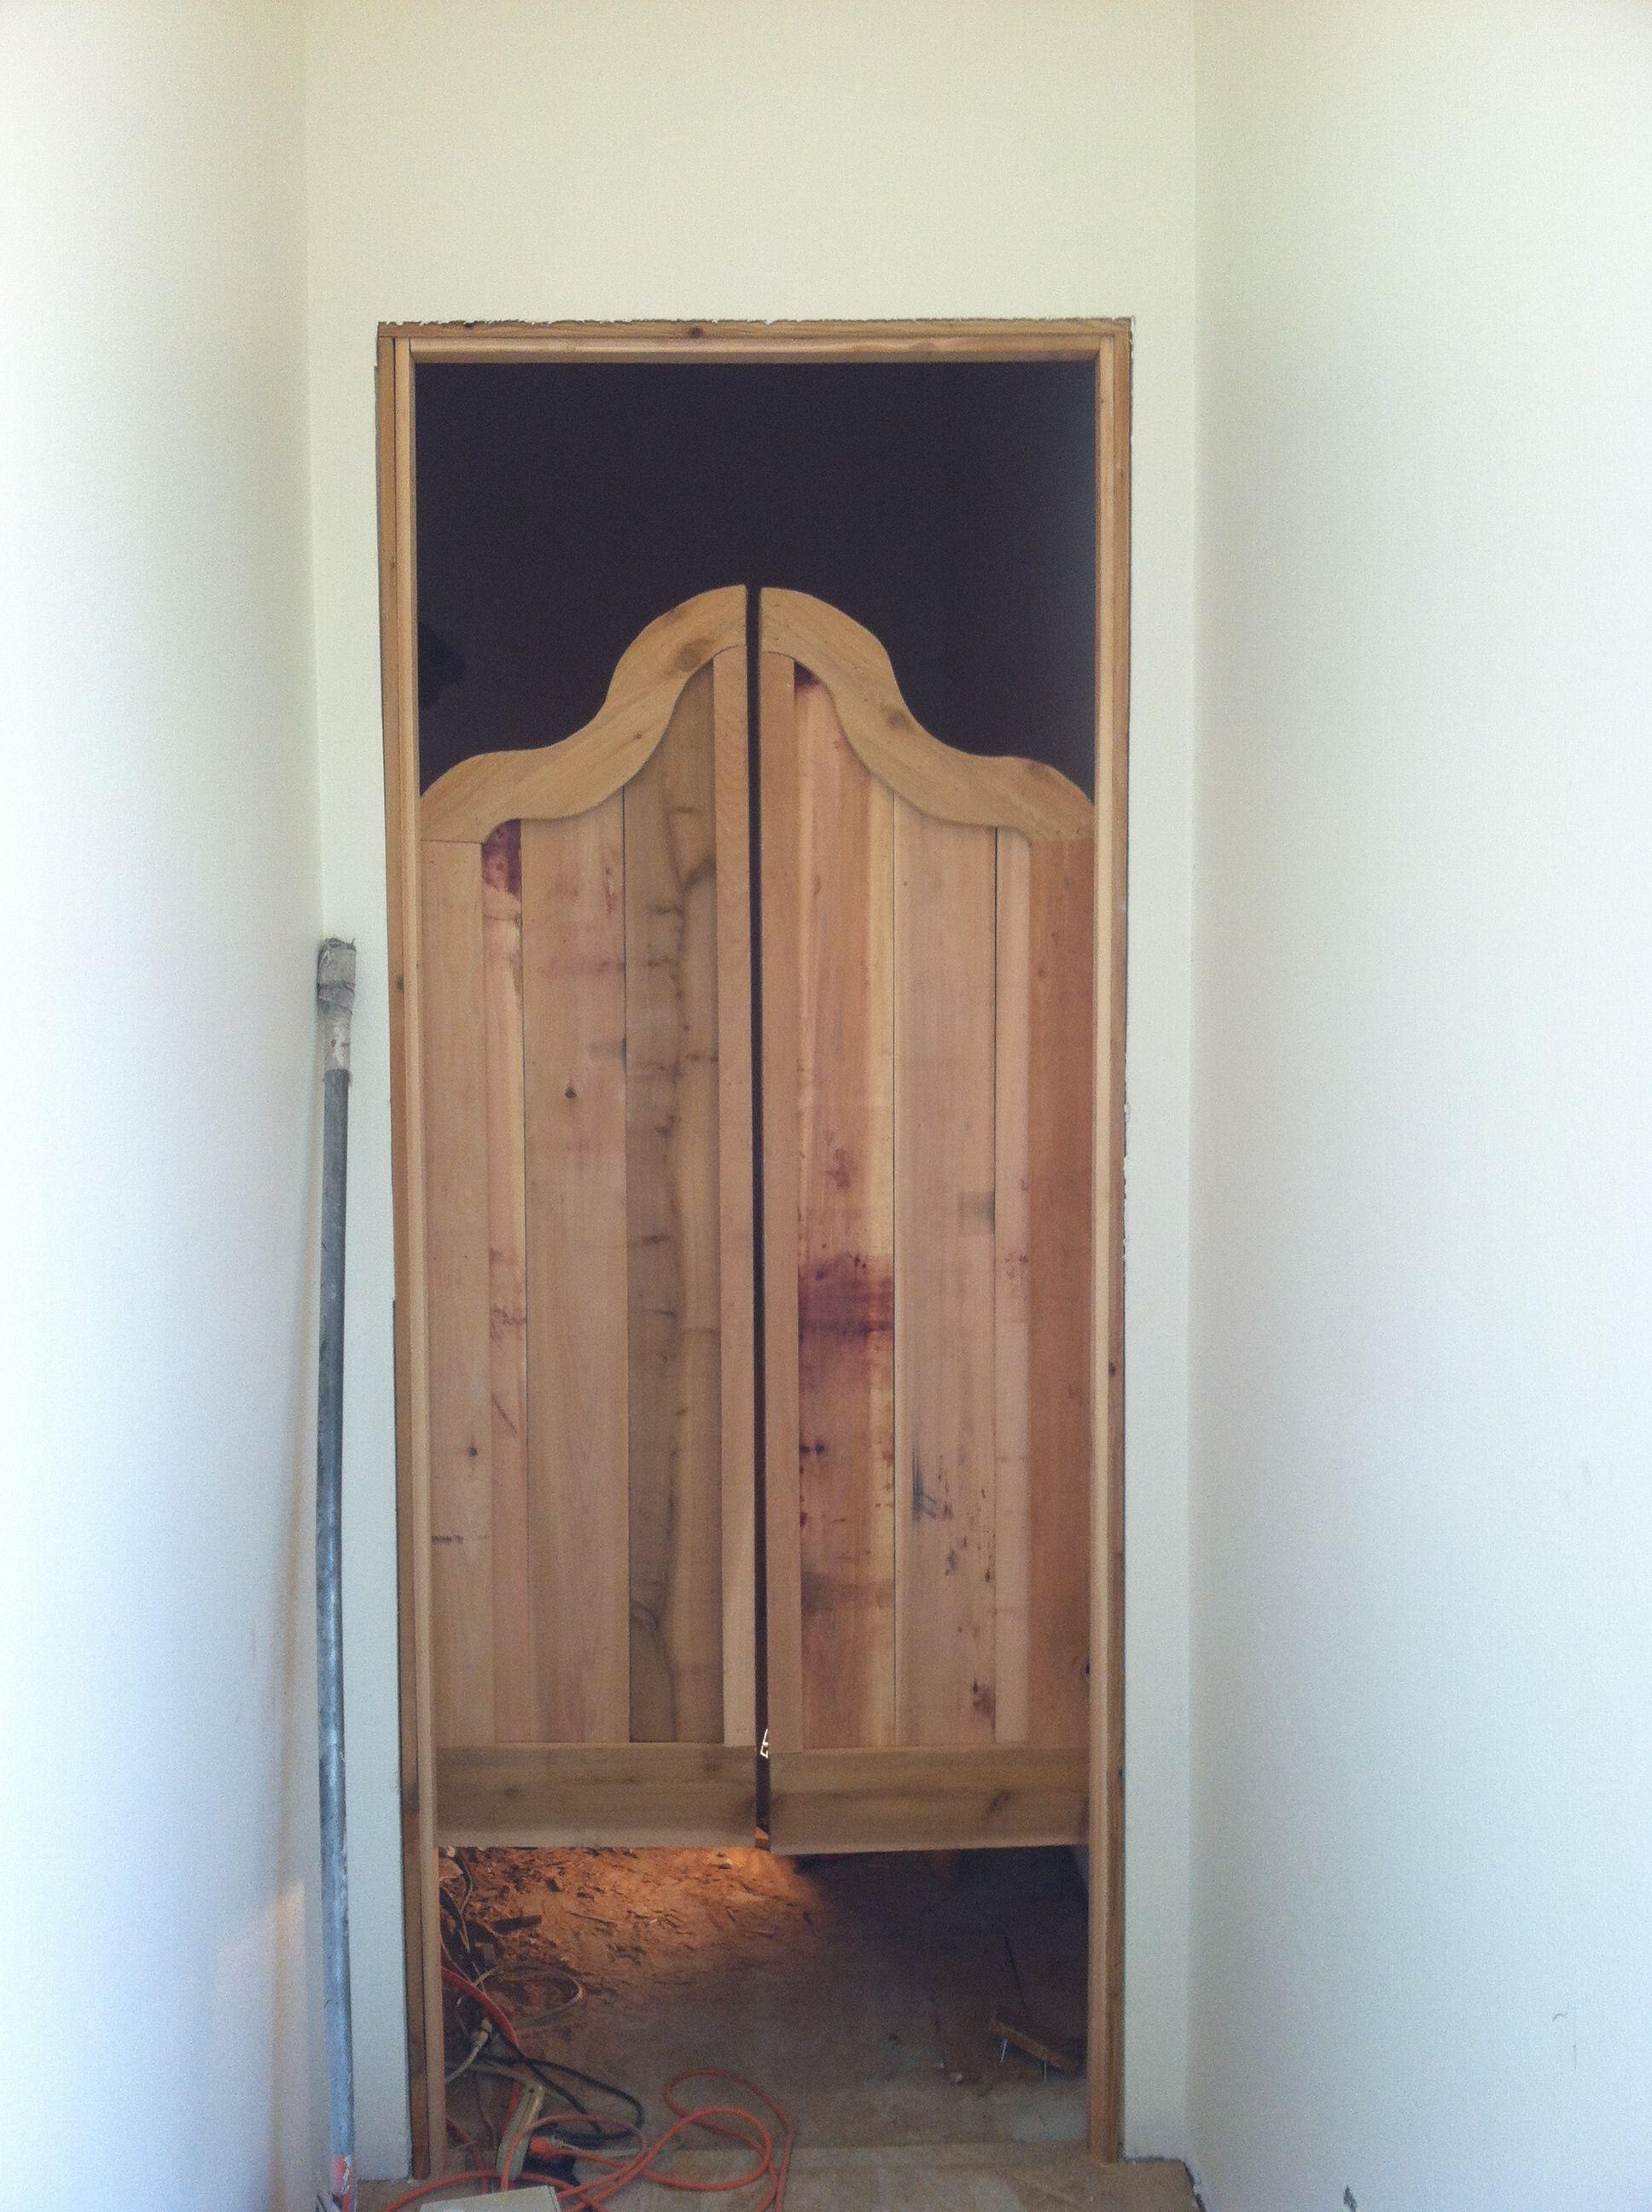 Cedar saloon doors   Construction projects   Pinterest ...